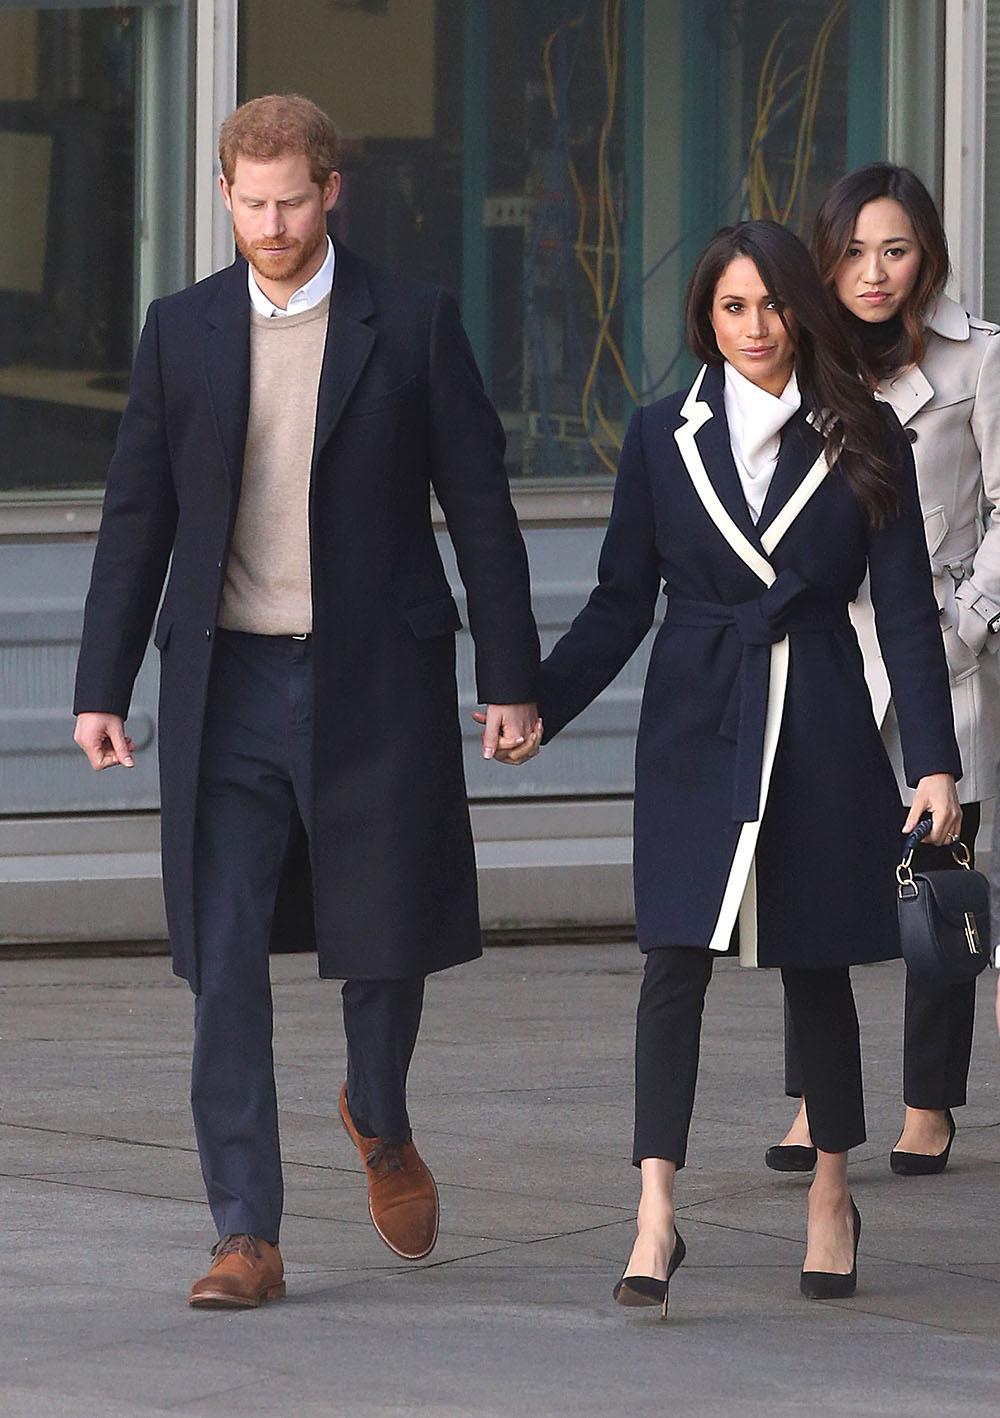 Prince Harry and Meghan Markle visit Birmingham